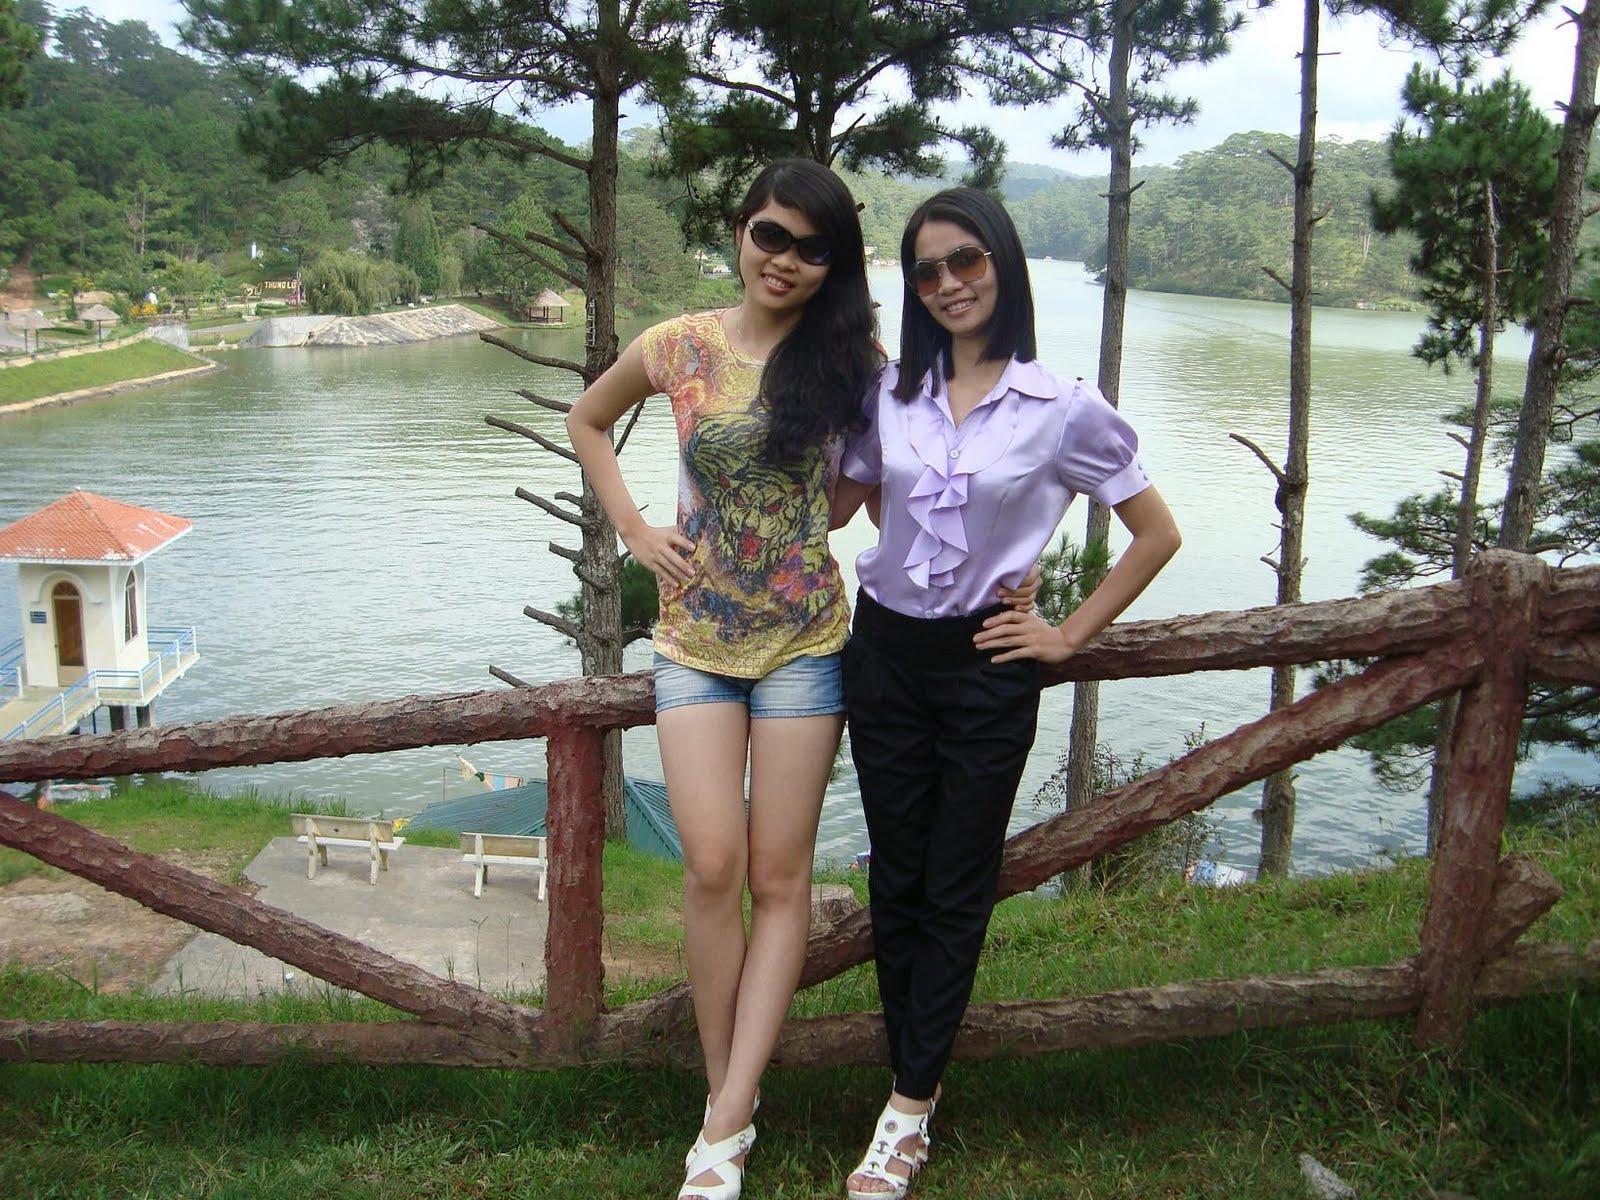 Danang Girls - Vietnamese girls